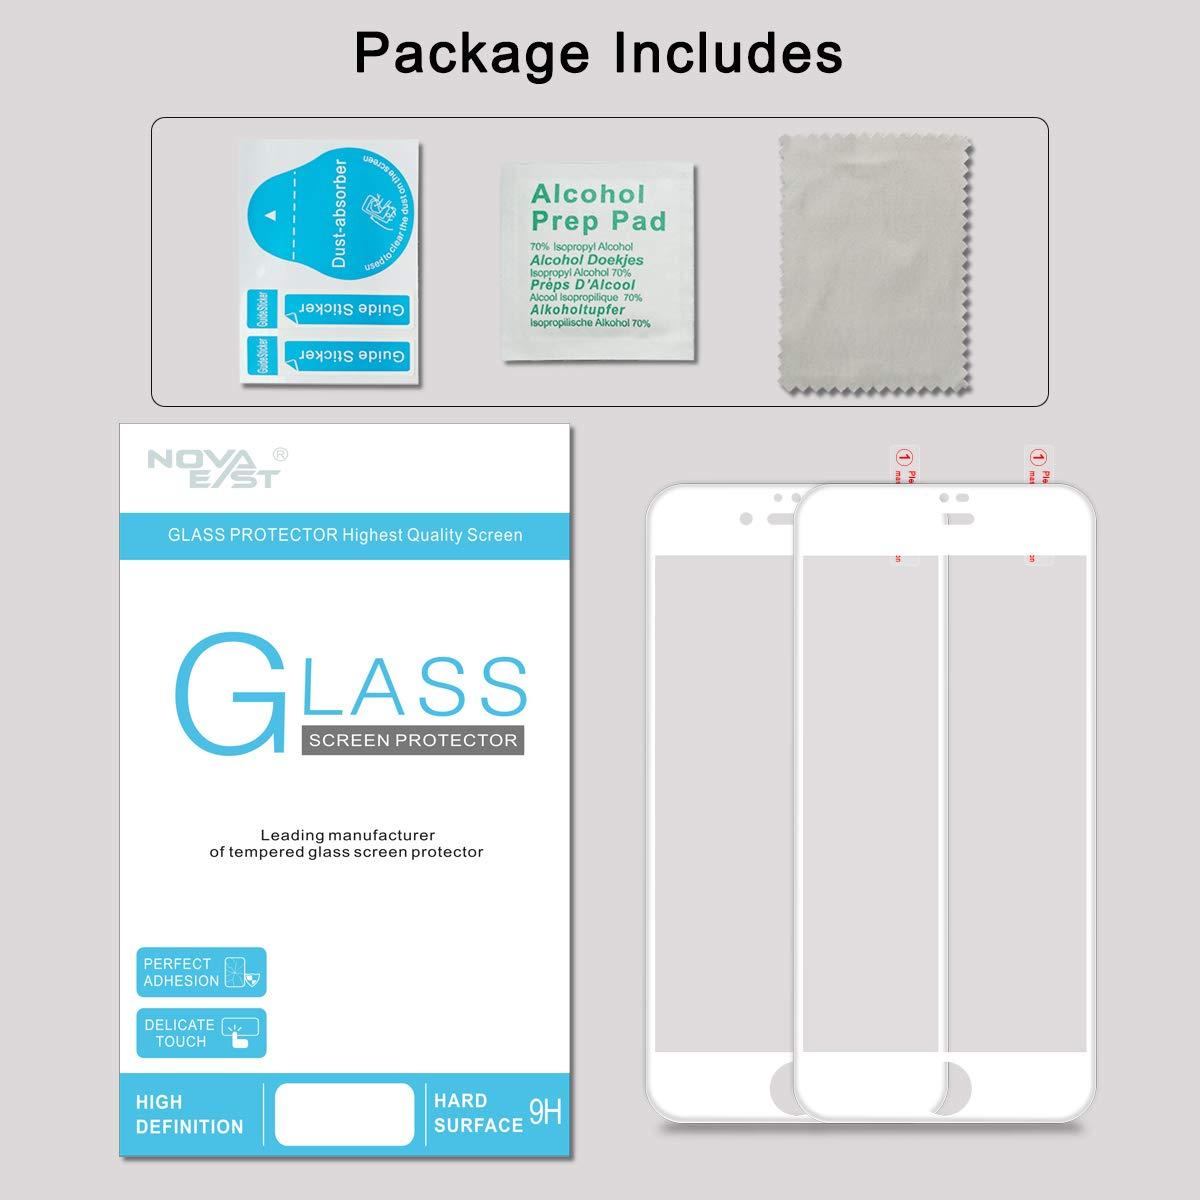 Anspruchsvoll Alkohol Definition Galerie Von Novaeast [2 Pack] Iphone 7 Screen Protector,